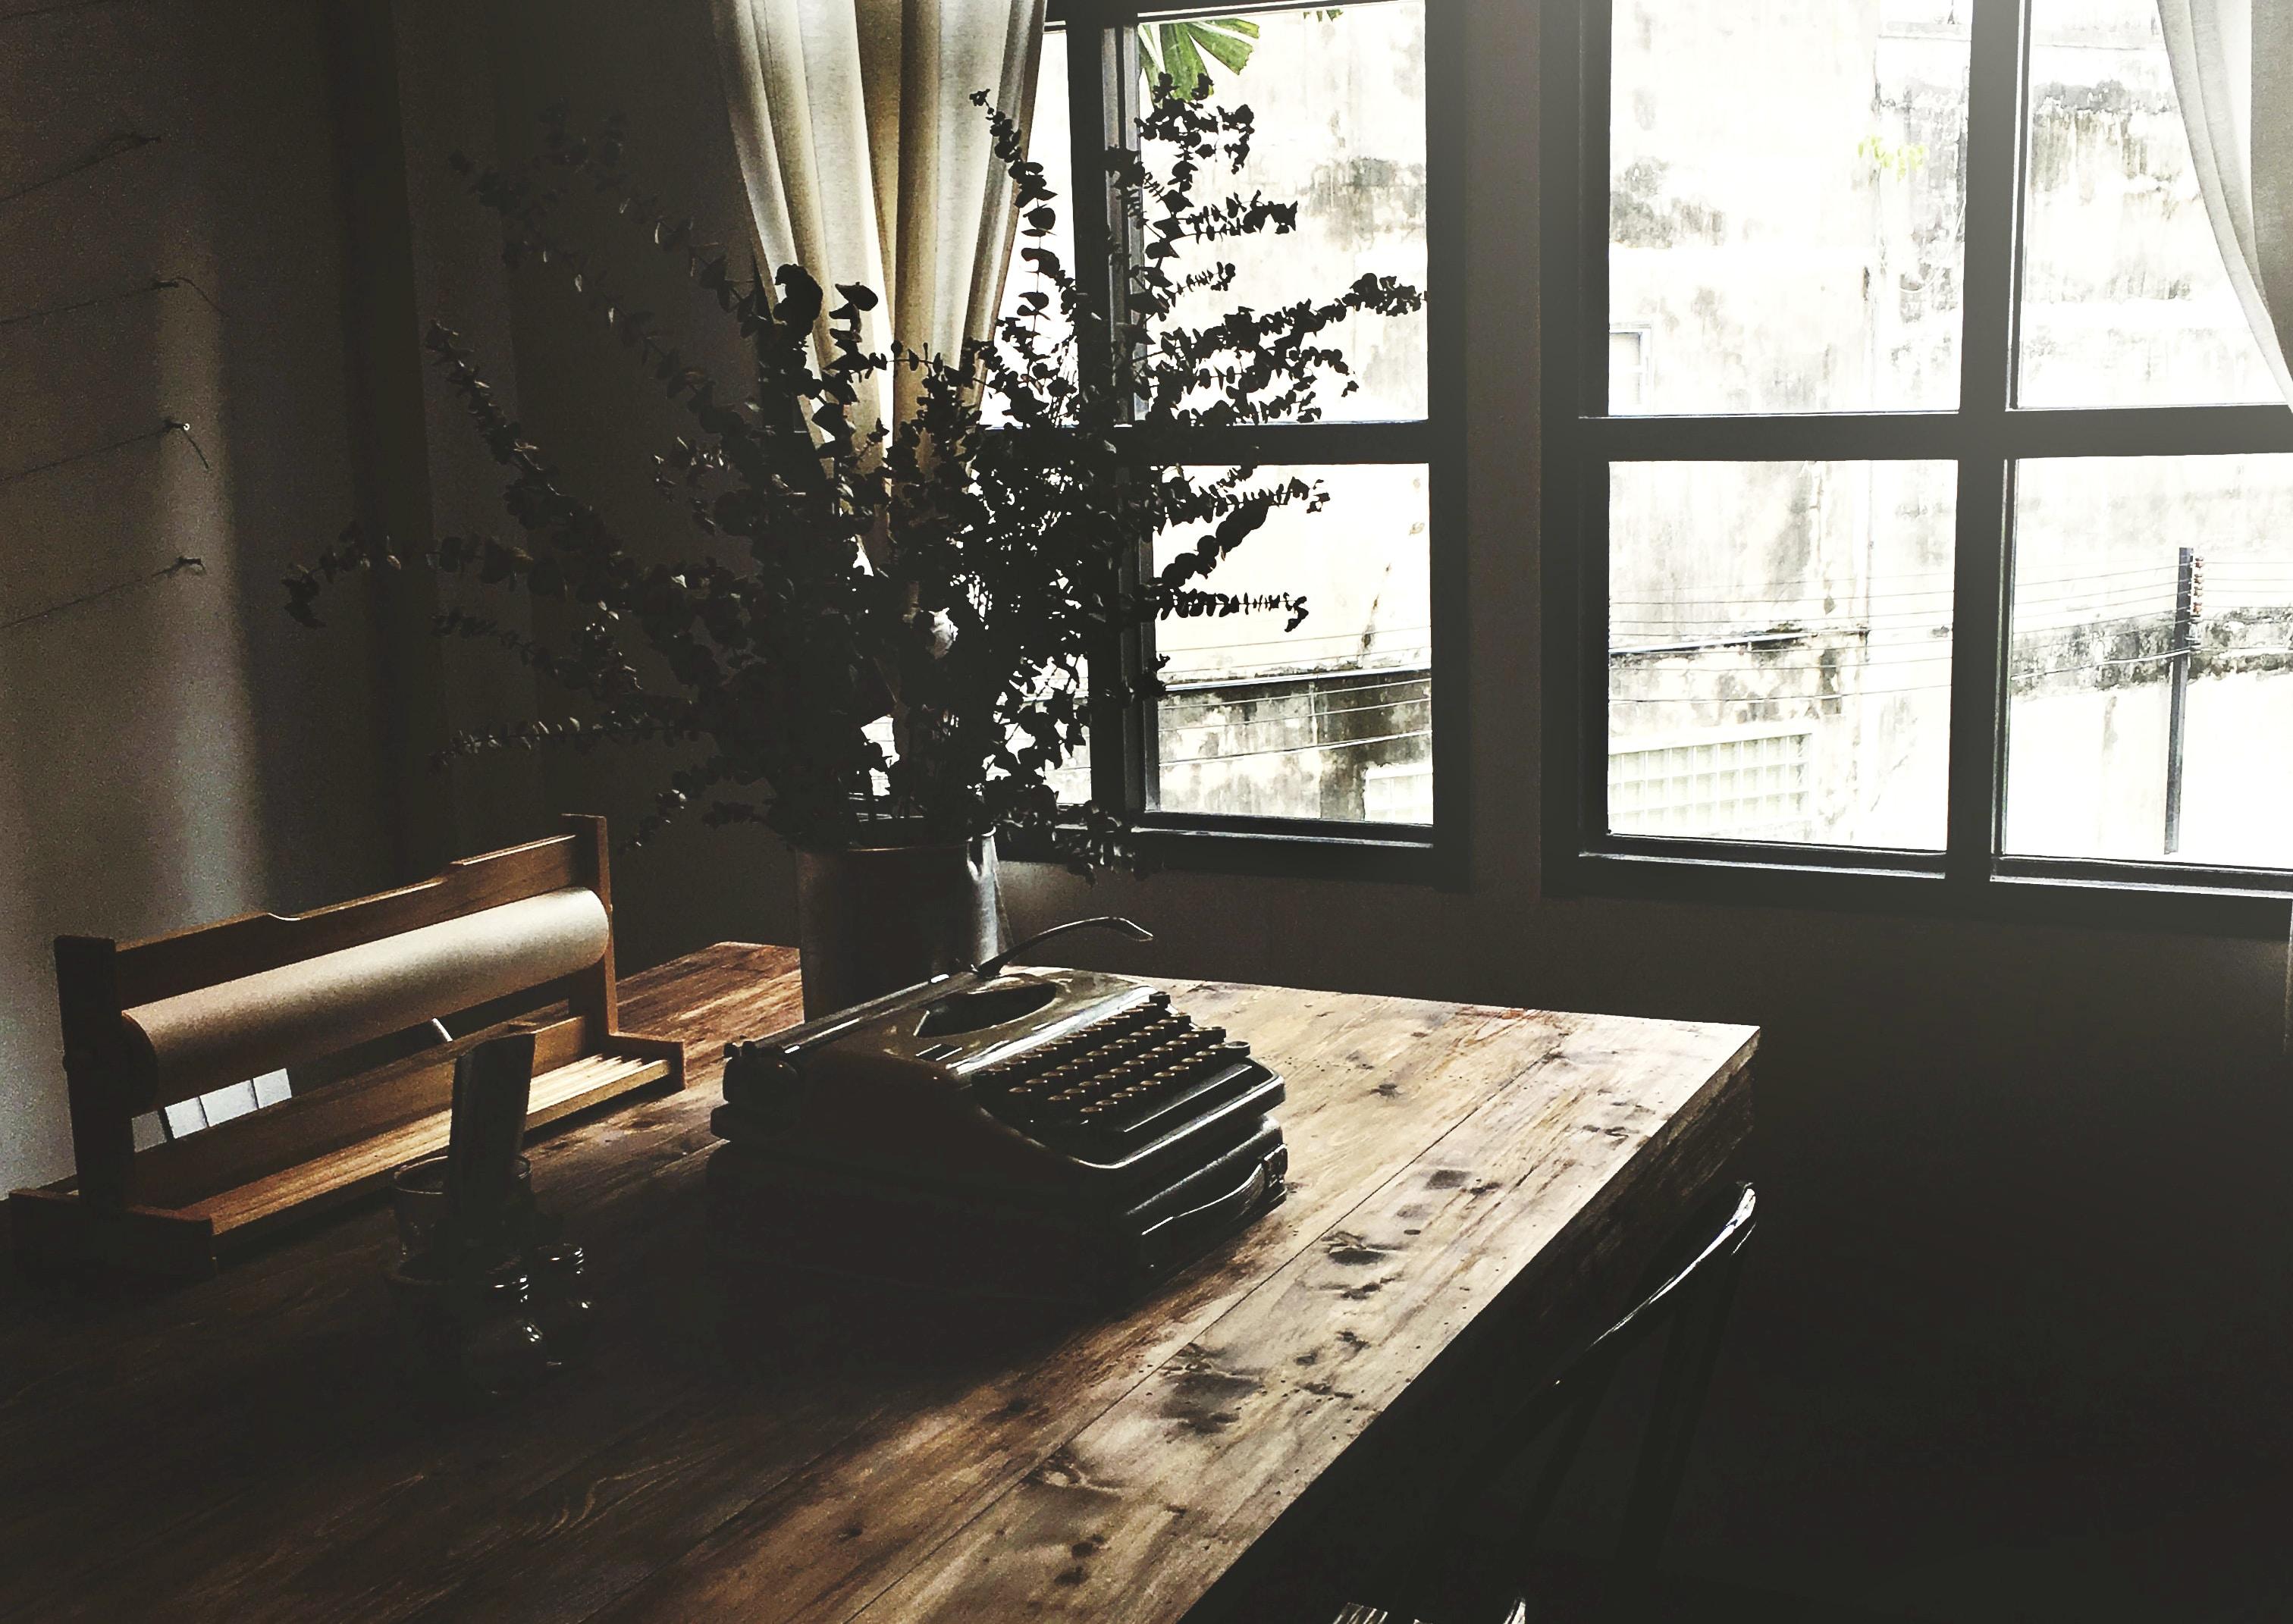 typewriter on wooden table near a window